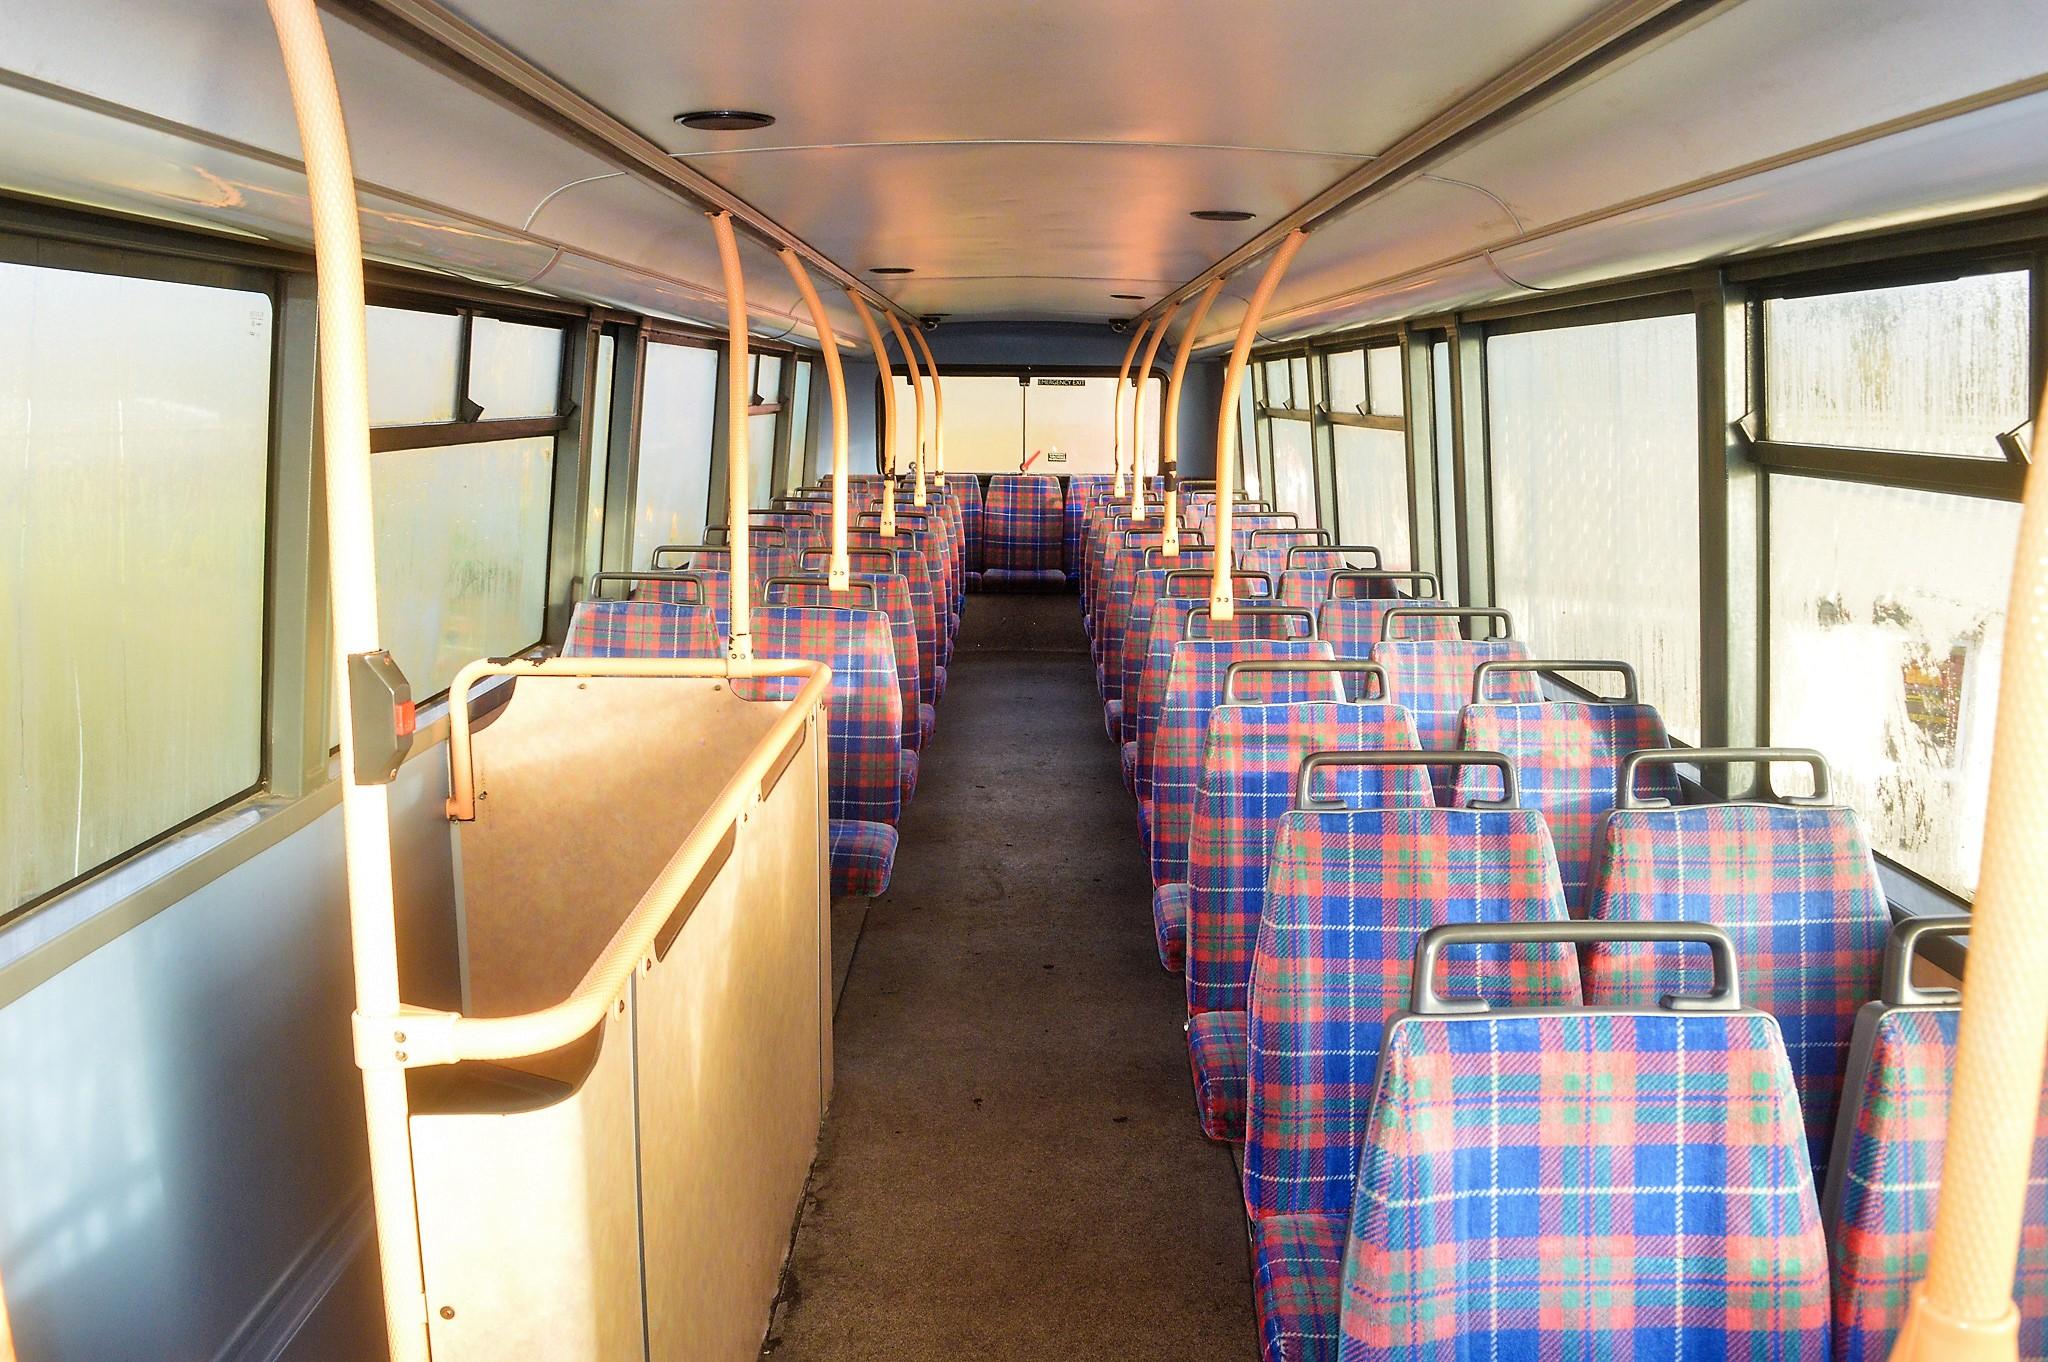 Lot 11 - Alexander Dennis Trident Plaxton President 75 seat double deck service bus Registration Number: V533